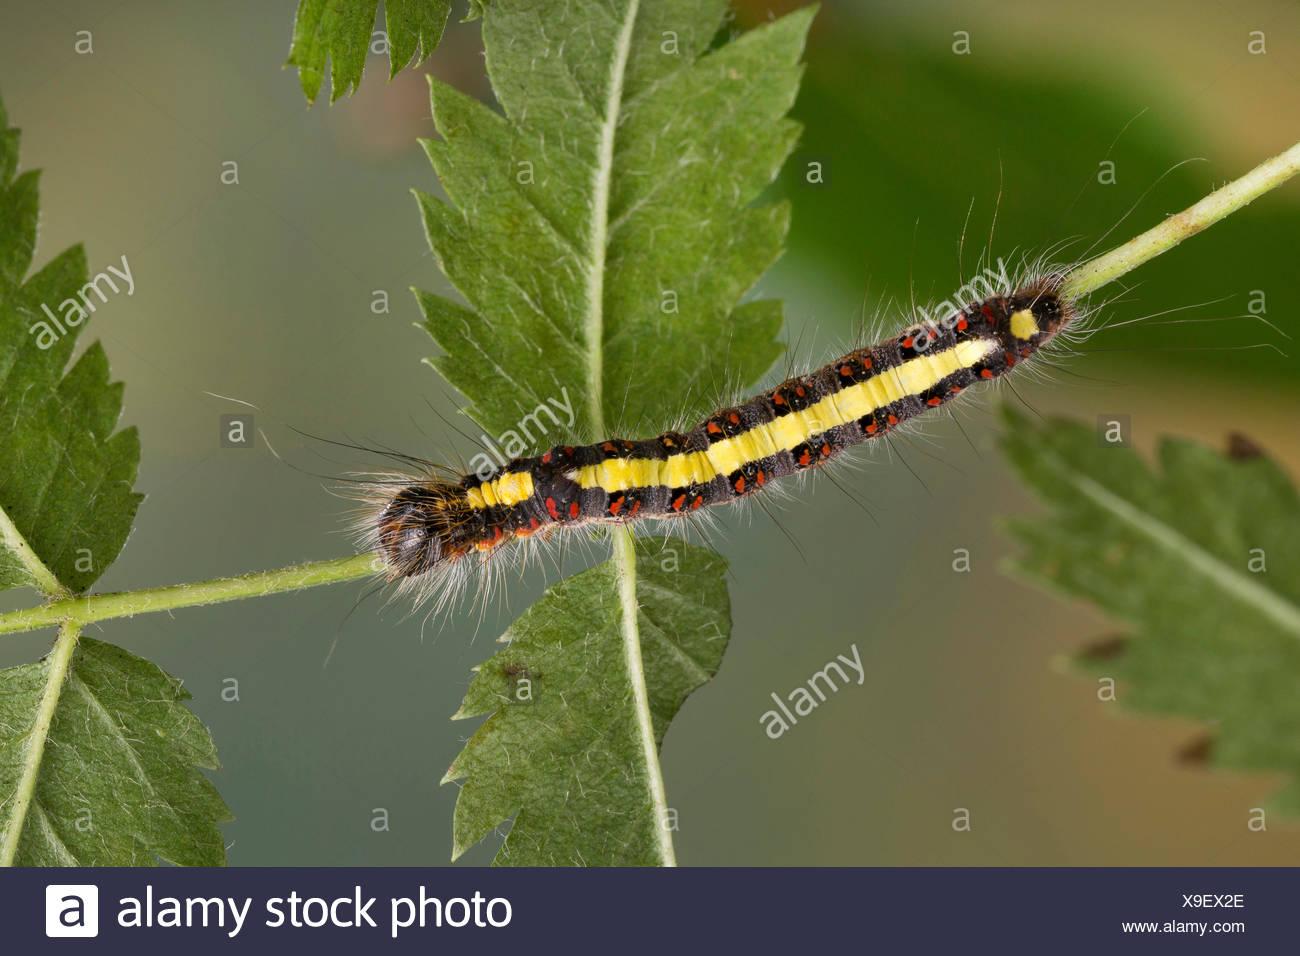 Grey dagger, Grey dagger moth (Acronicta psi, Acronycta psi, Apatele psi), caterpillar on a leaf, Germany - Stock Image